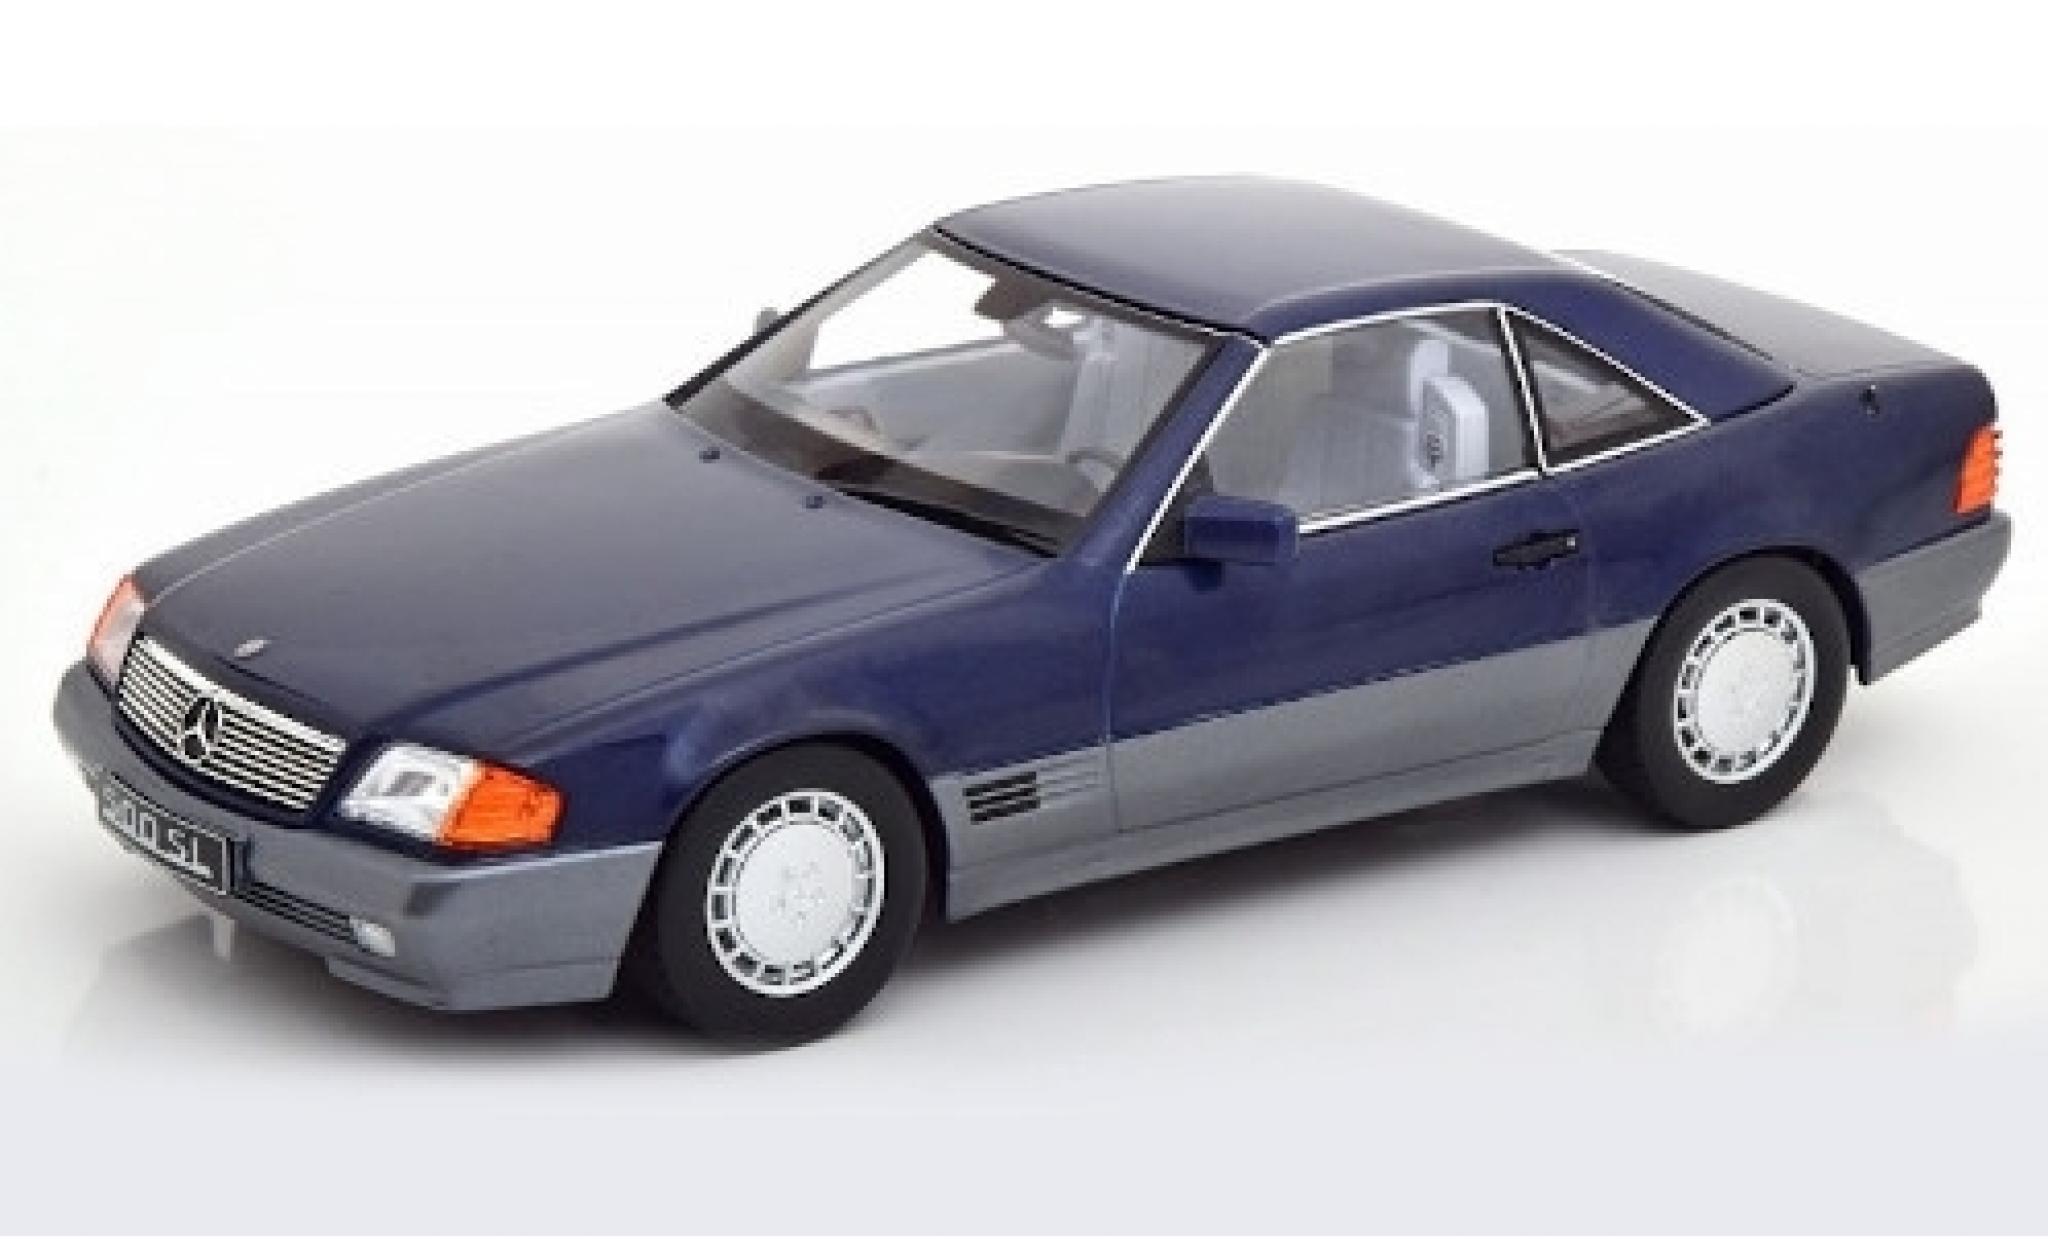 Mercedes 500 1/18 KK Scale SL (R129) metallise bleue 1993